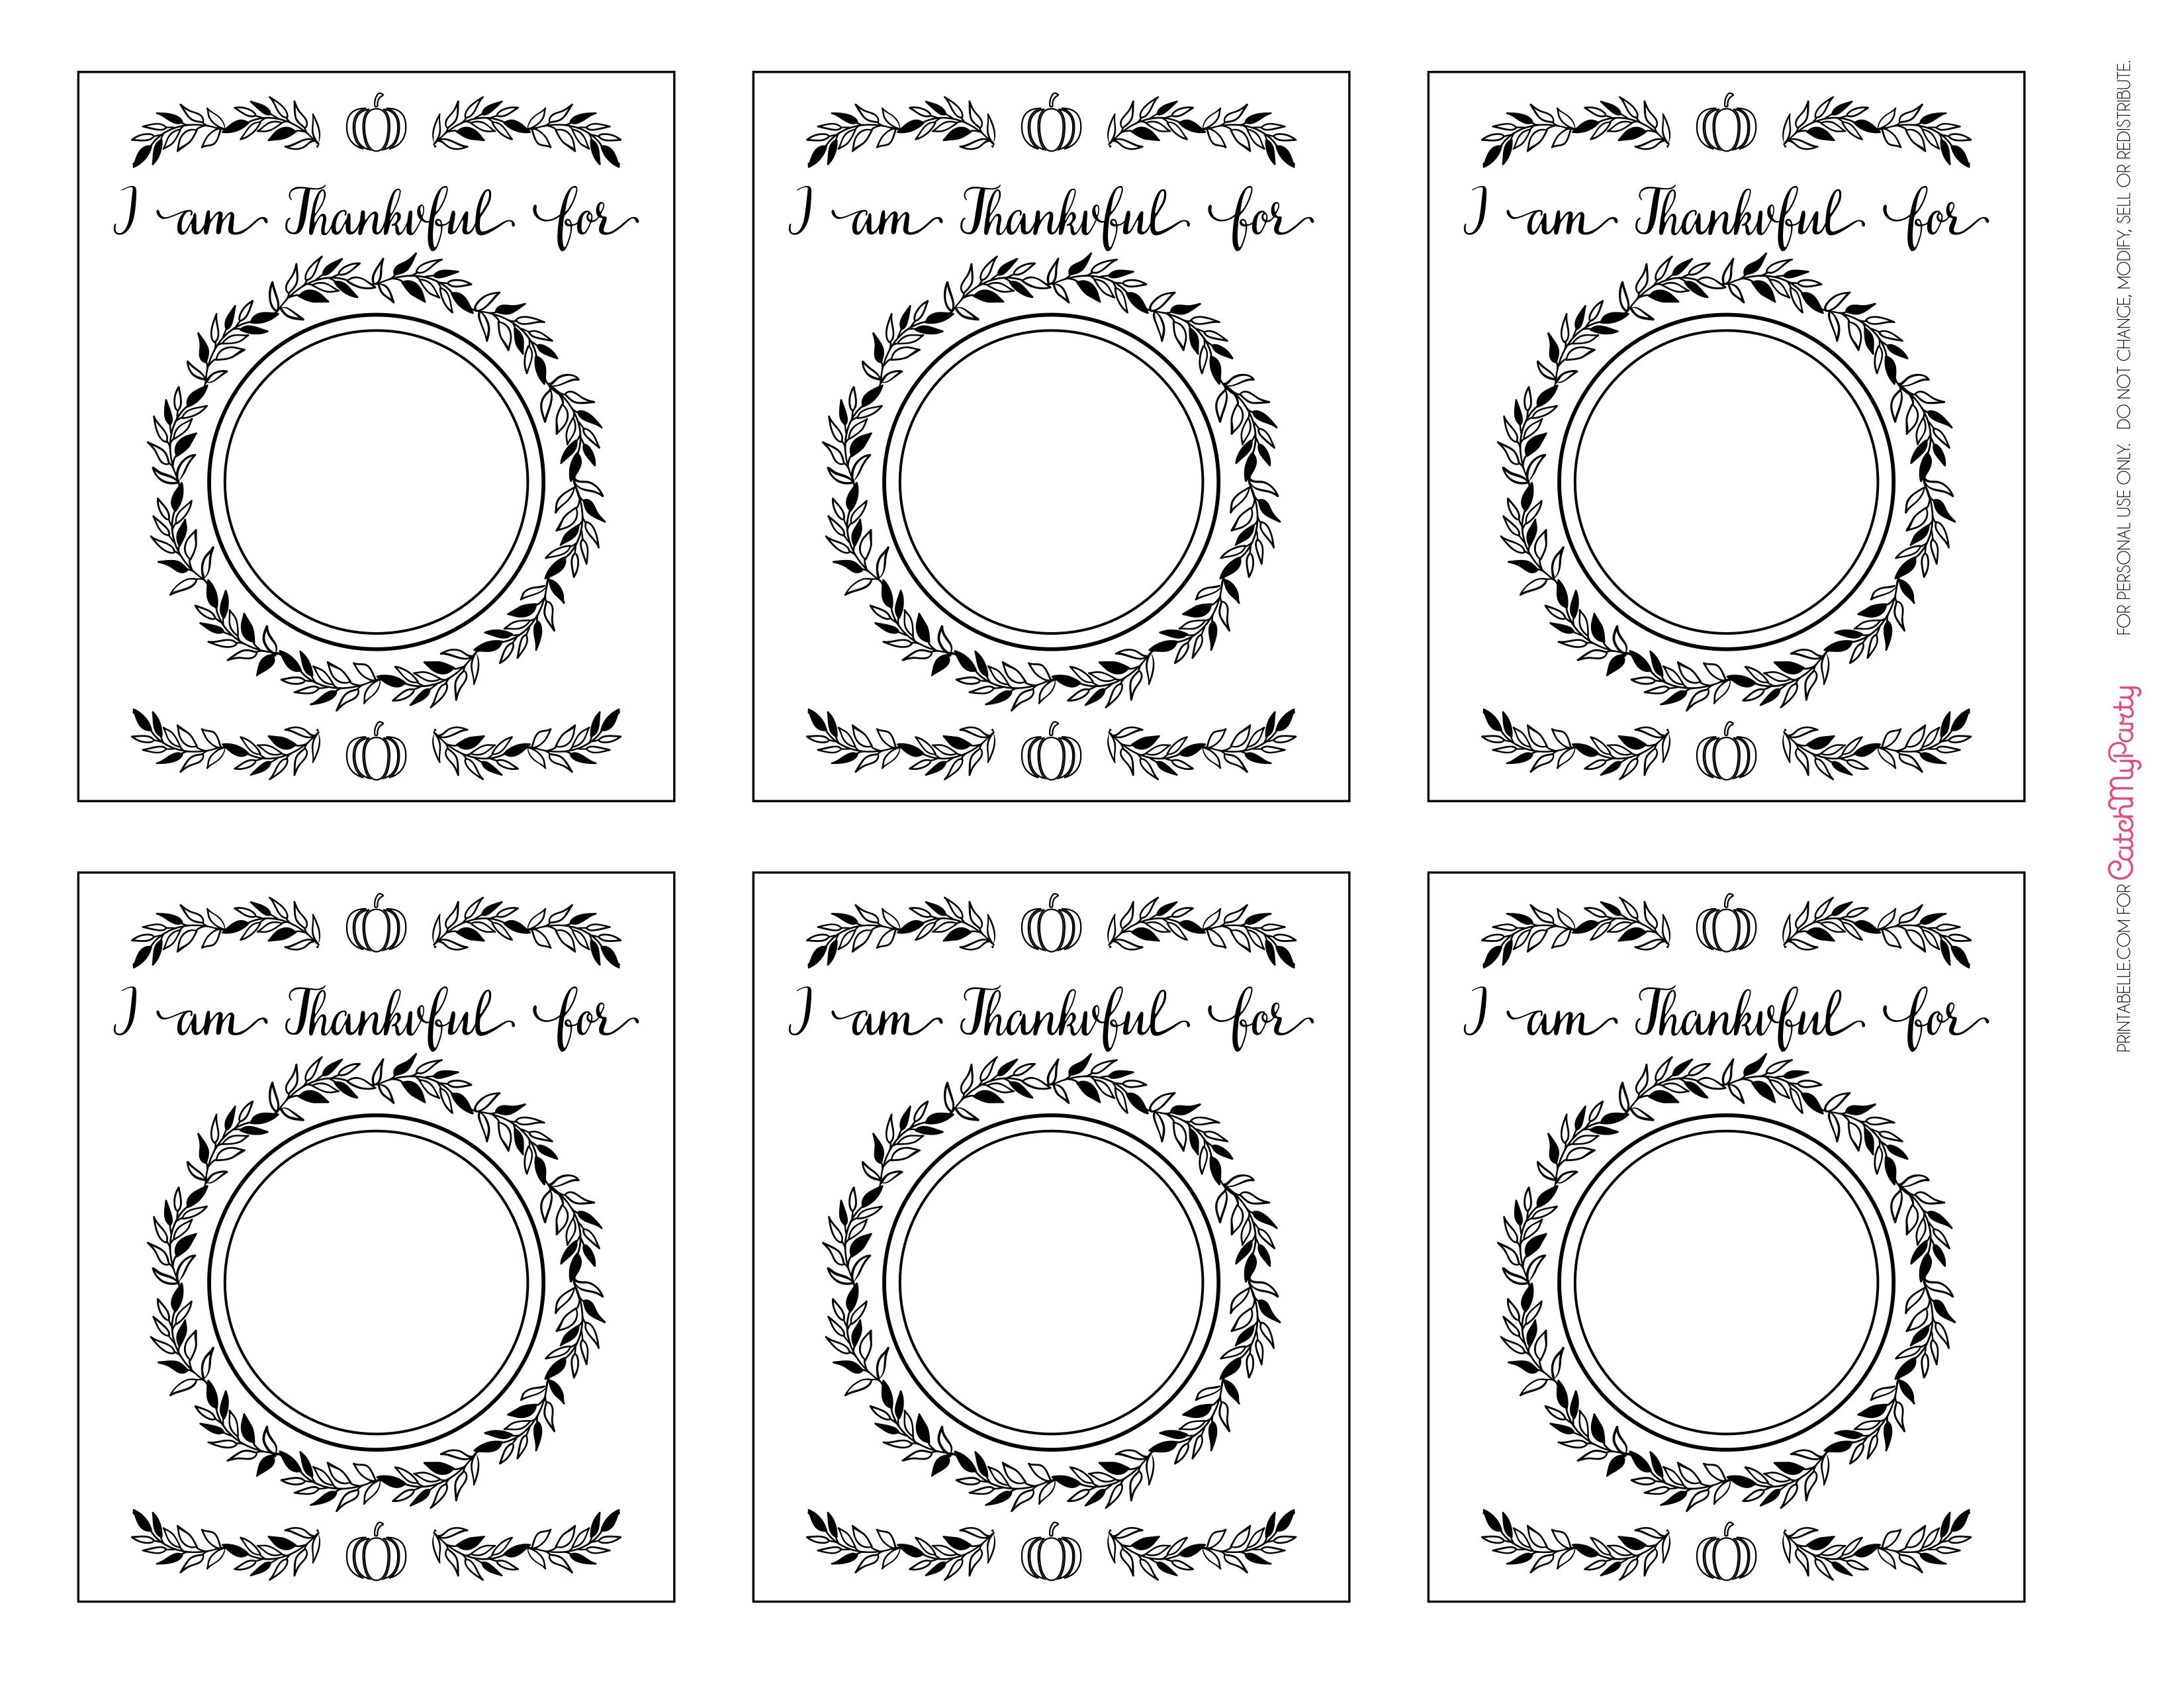 image regarding Thankful Printable referred to as No cost Printable \